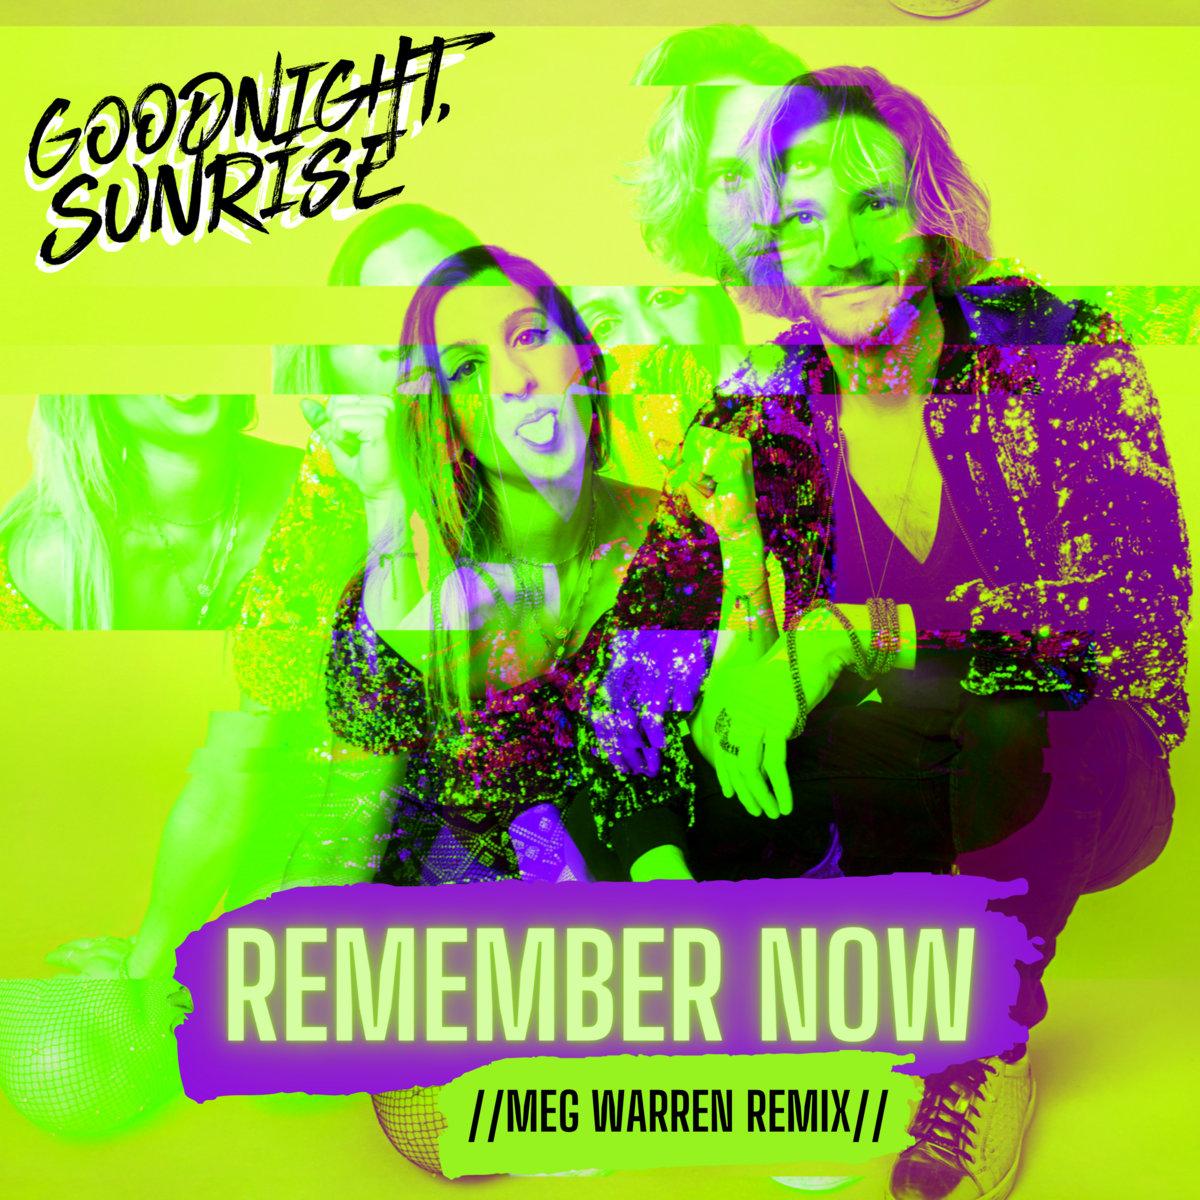 Remember Now - Meg Warren Remix by Goodnight, Sunrise